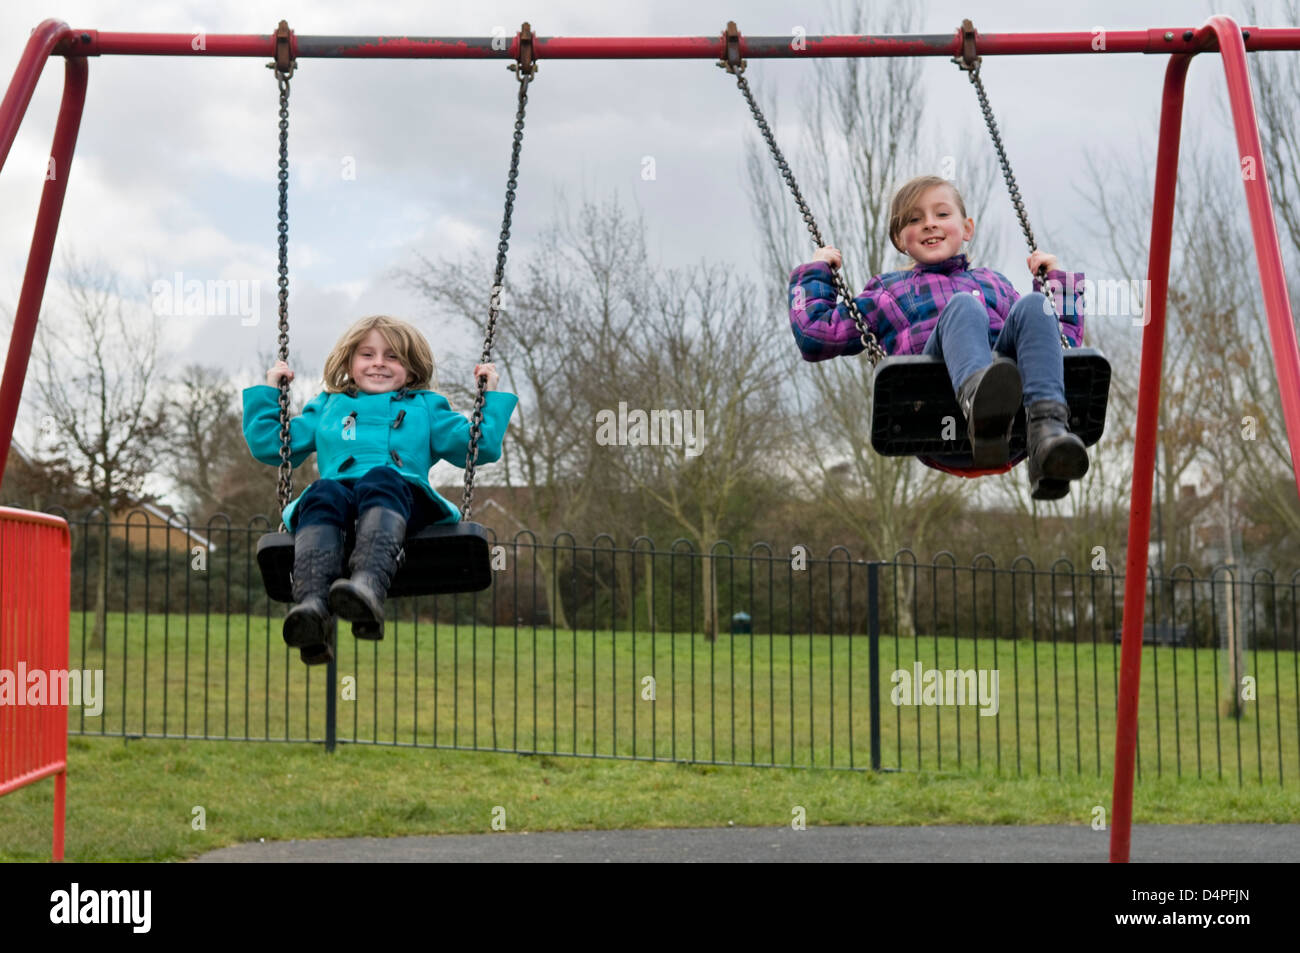 Two 8 year old Caucasian girls having fun playing on swings in park in Bristol, UK - Stock Image